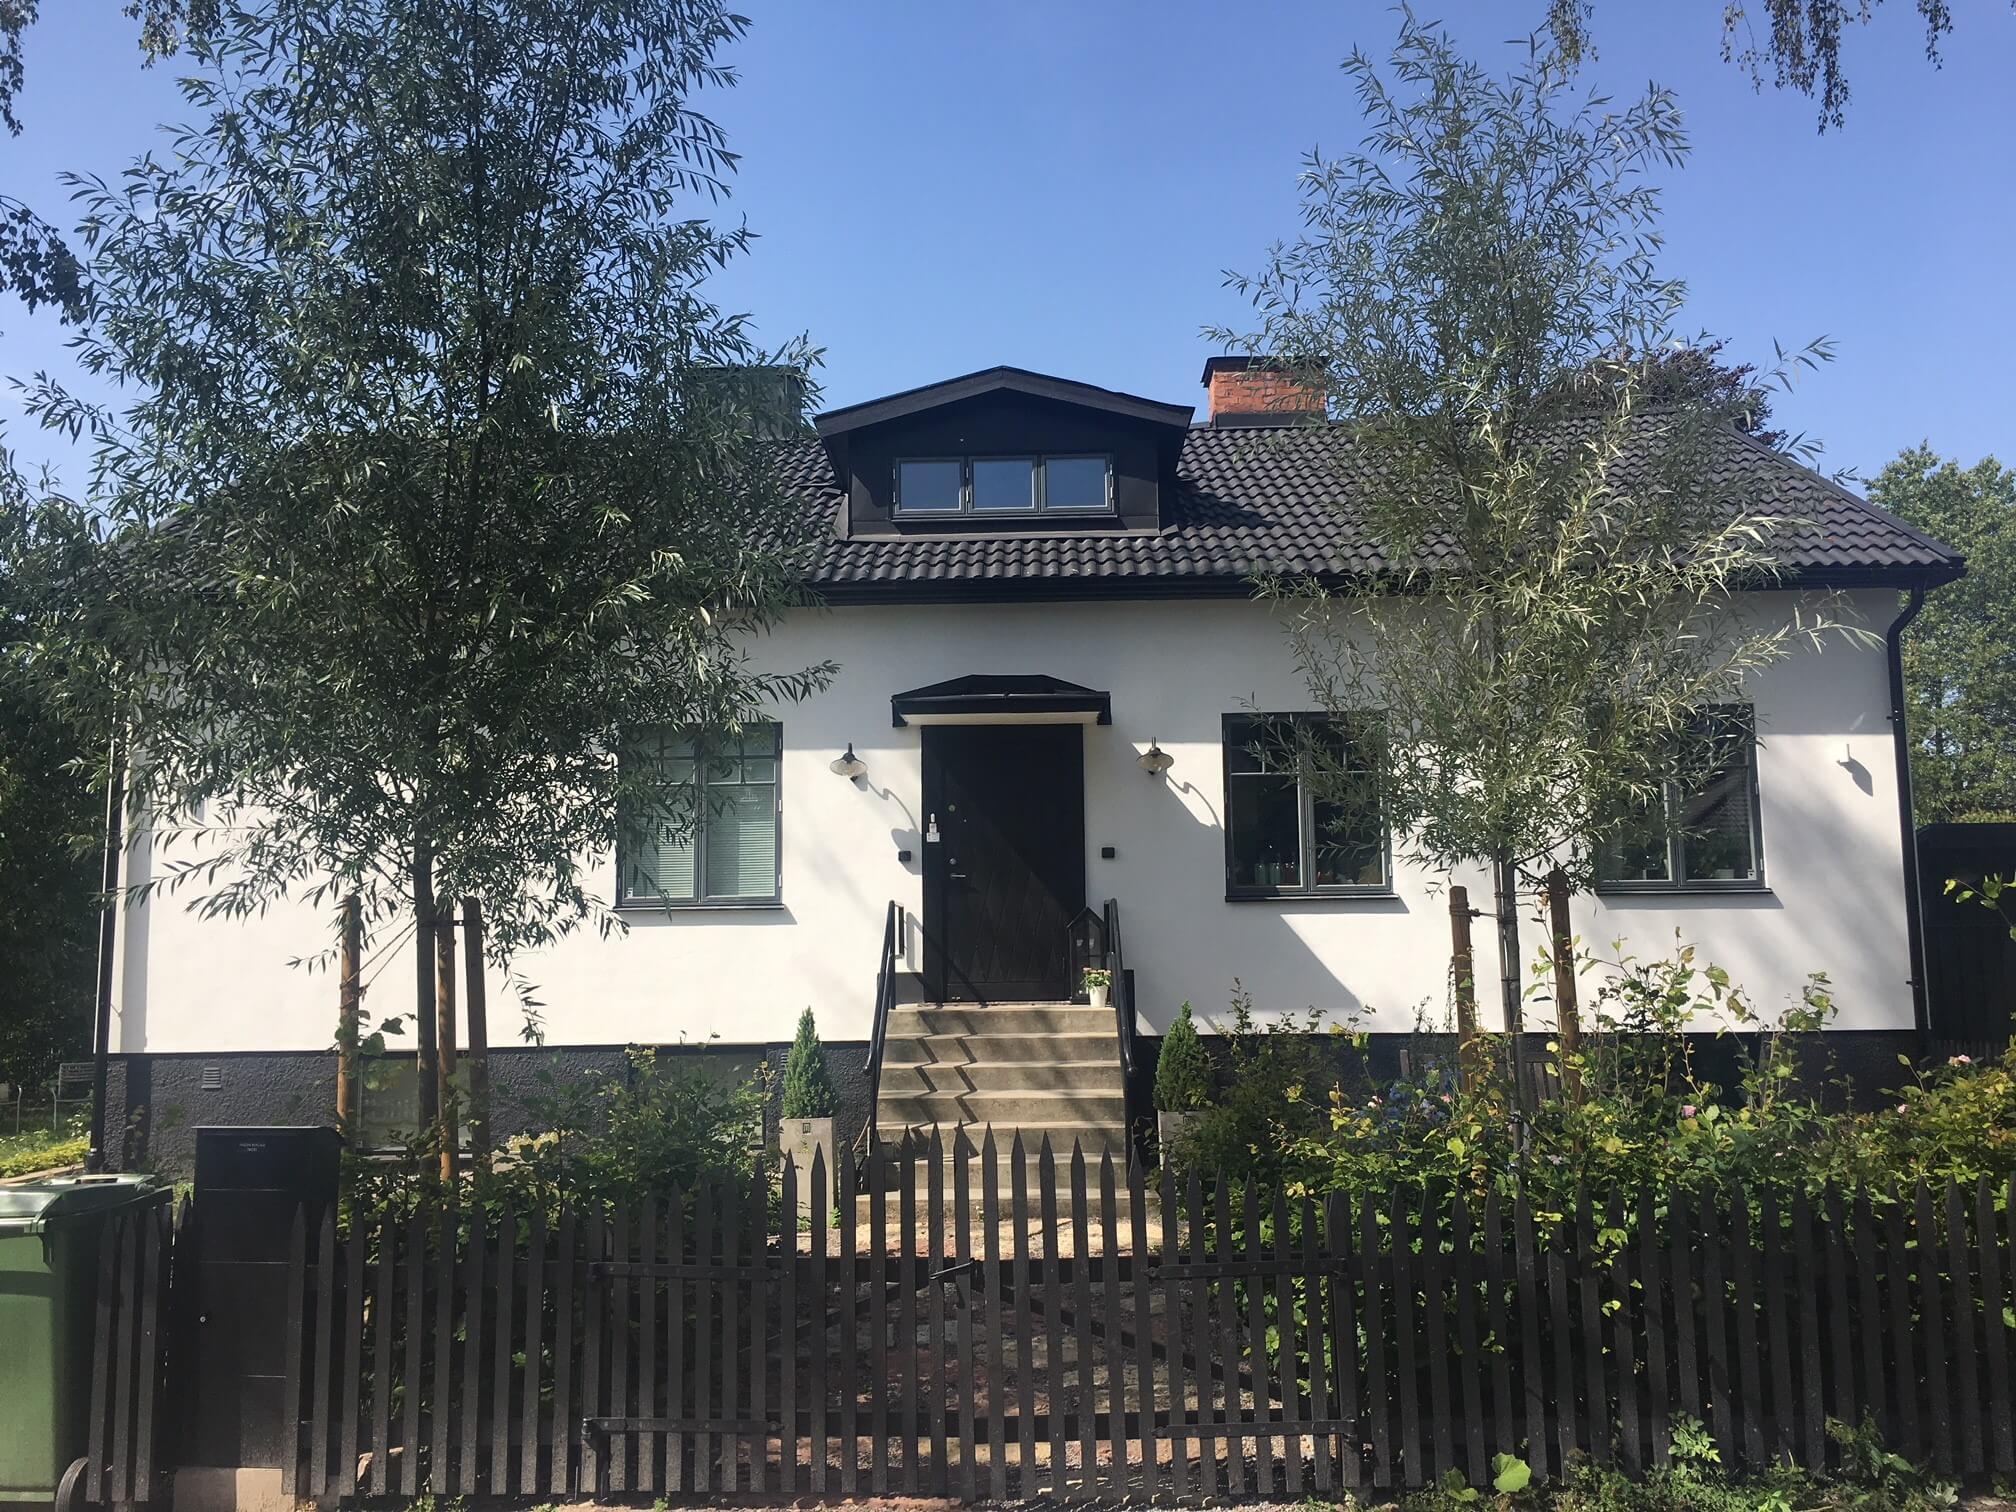 Fasadrenovering -Sollentuna